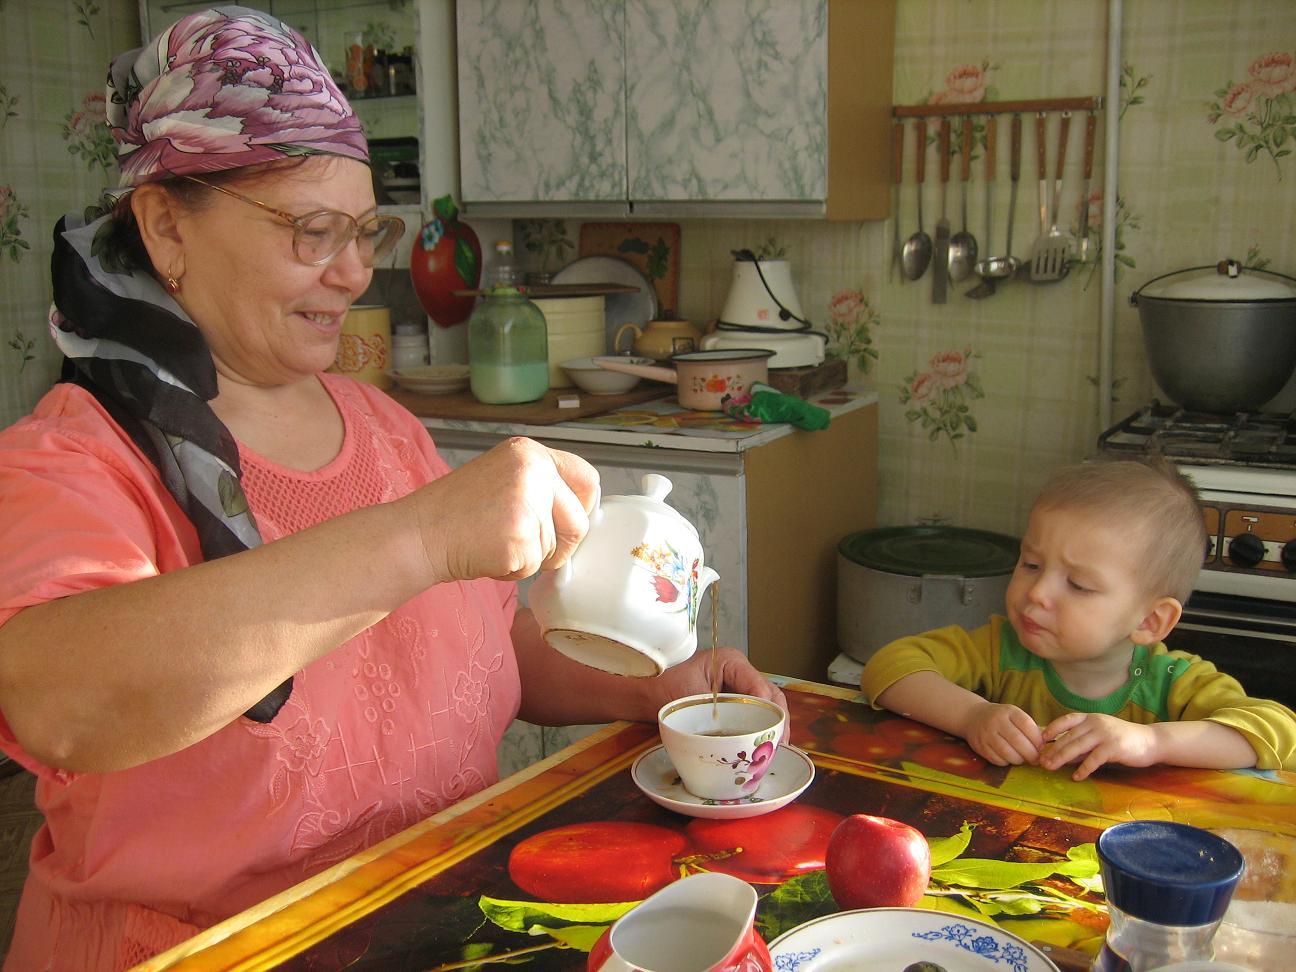 Про врачей, картинка приколов внук растолстел у бабушки